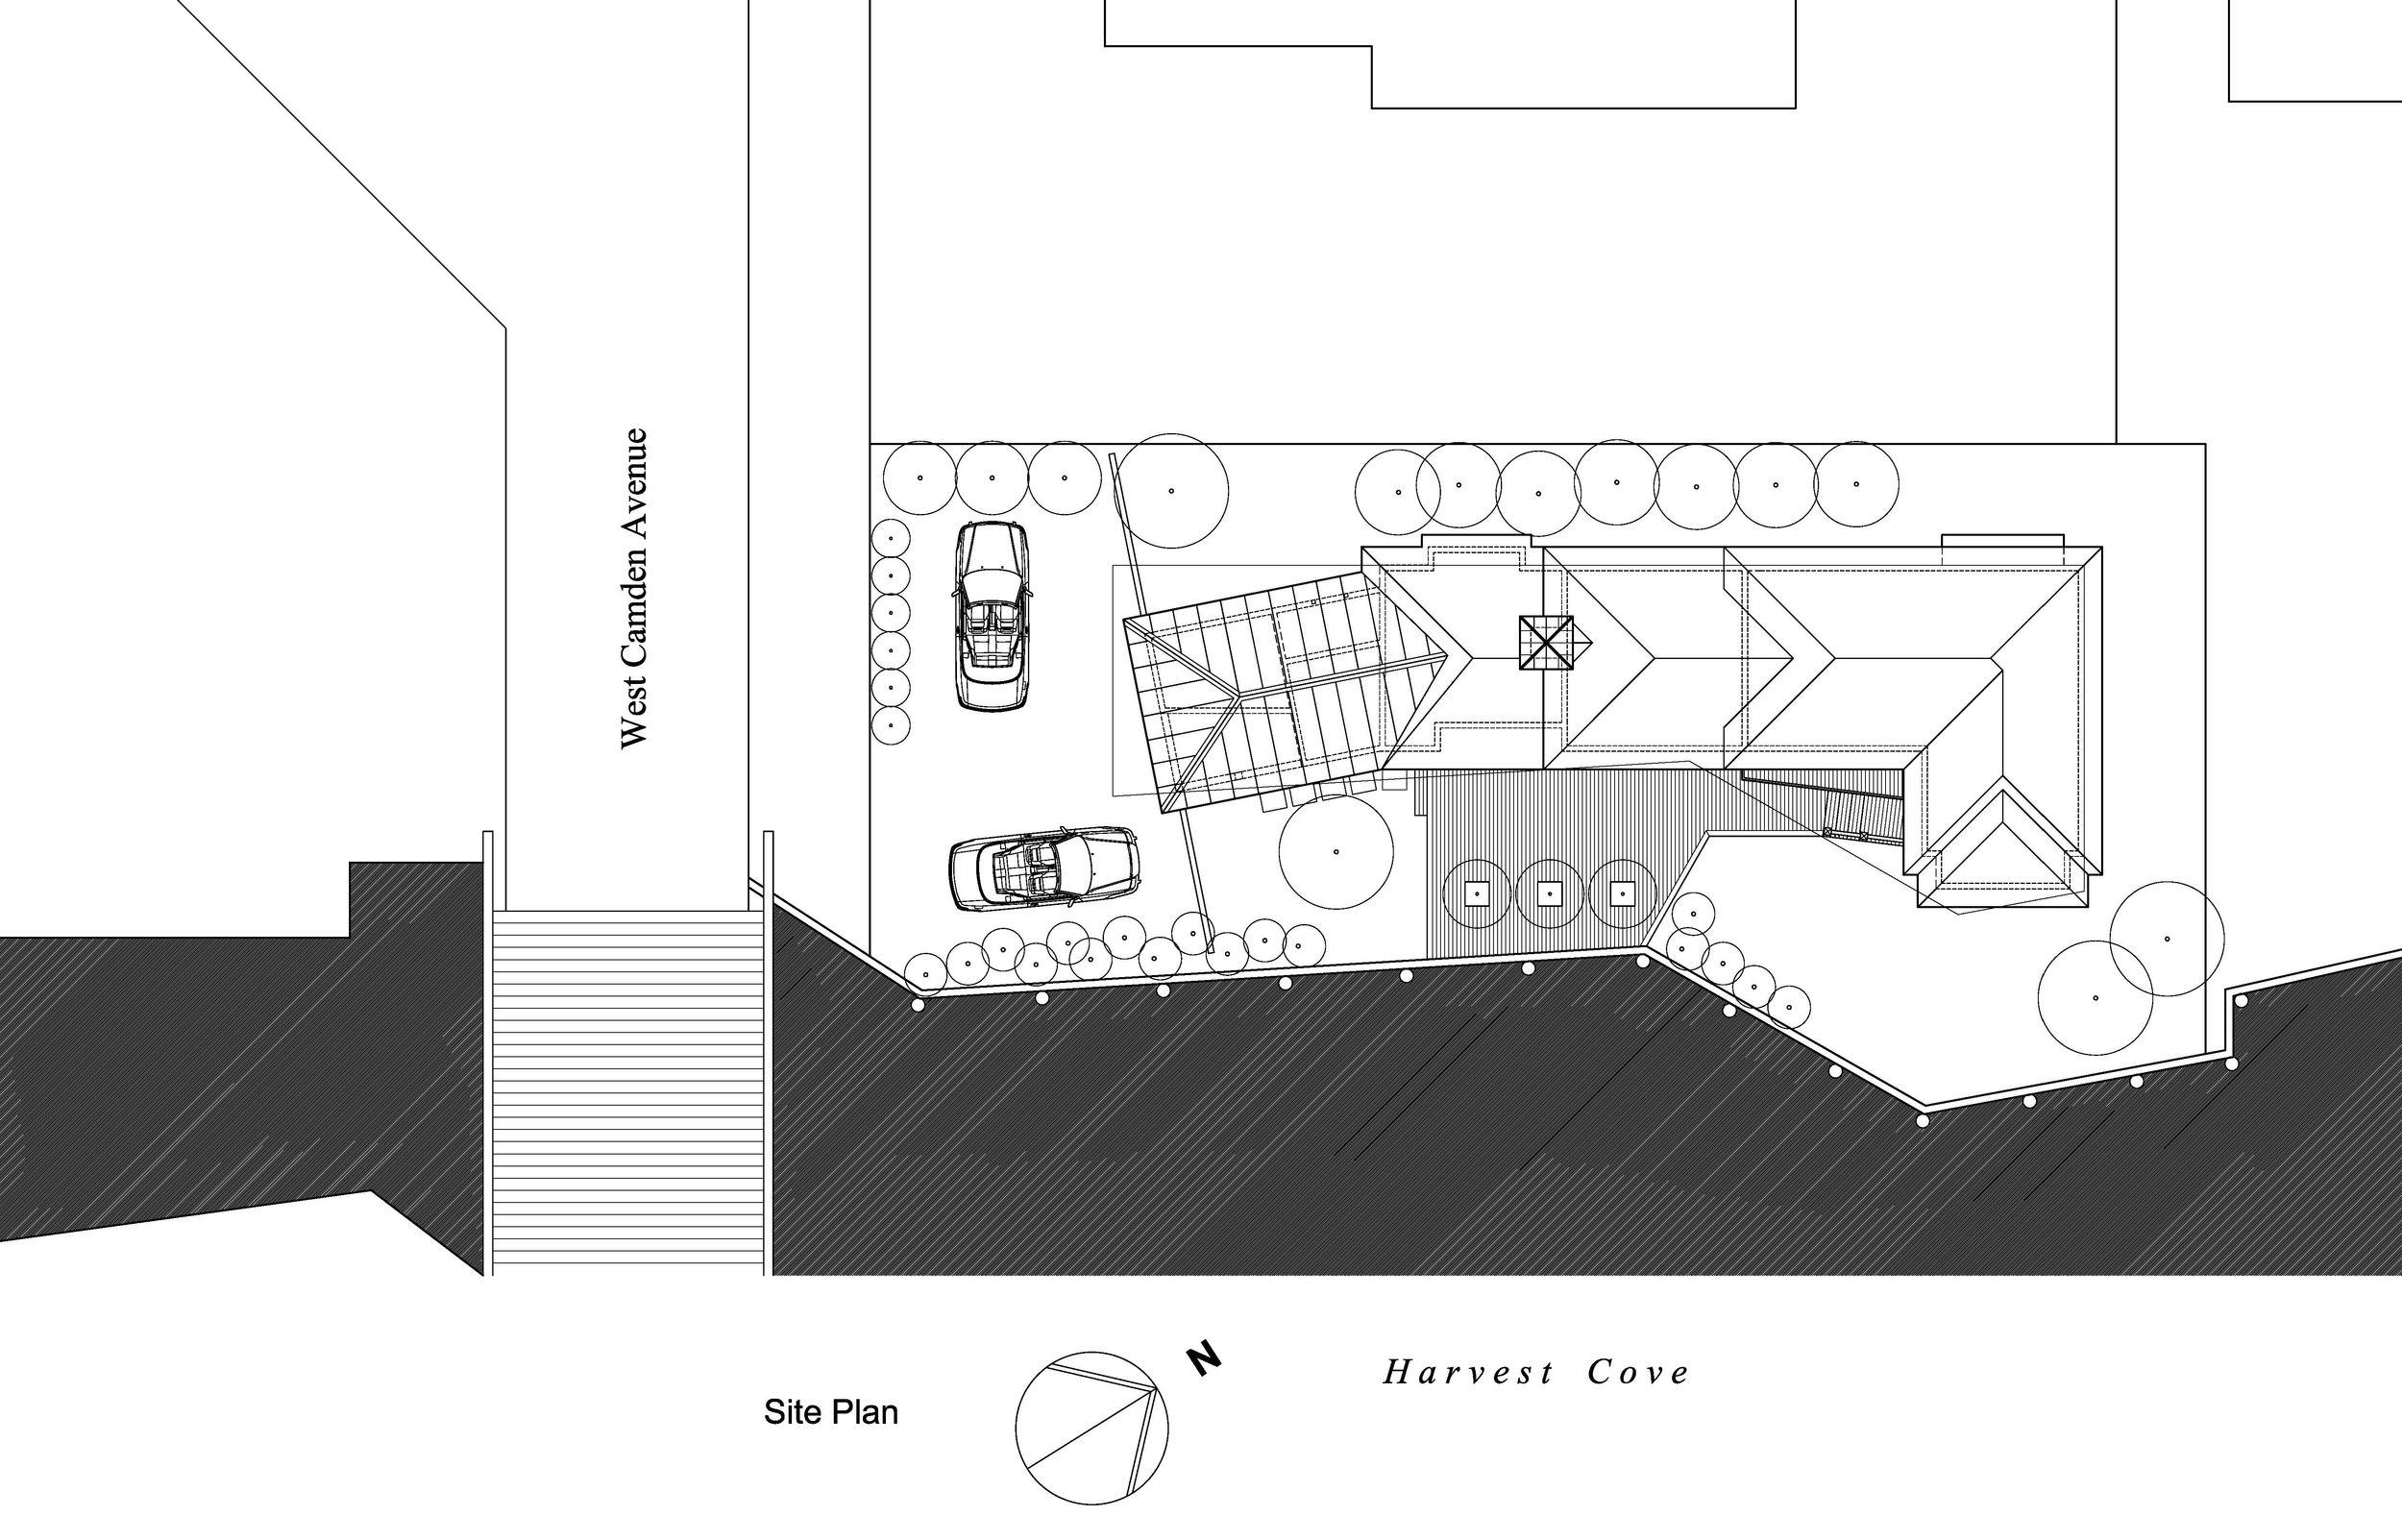 new_moon_cottage_site_plan.jpg